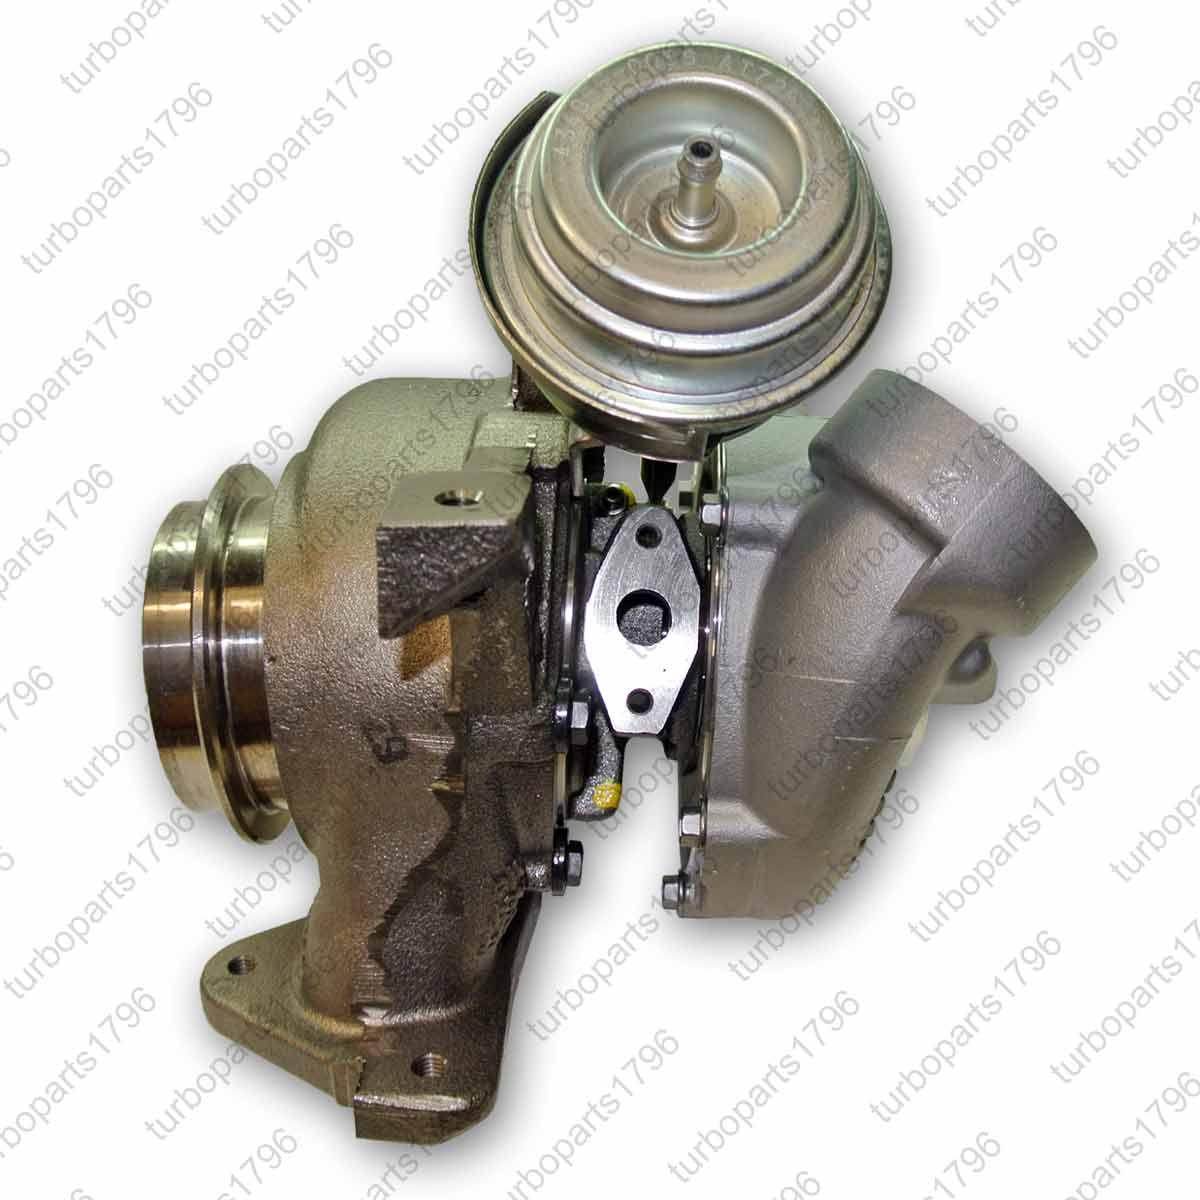 Turbolader Mercedes C270 G270 CDI 156 PS 170 PS OM612 6120960499 A6120960499